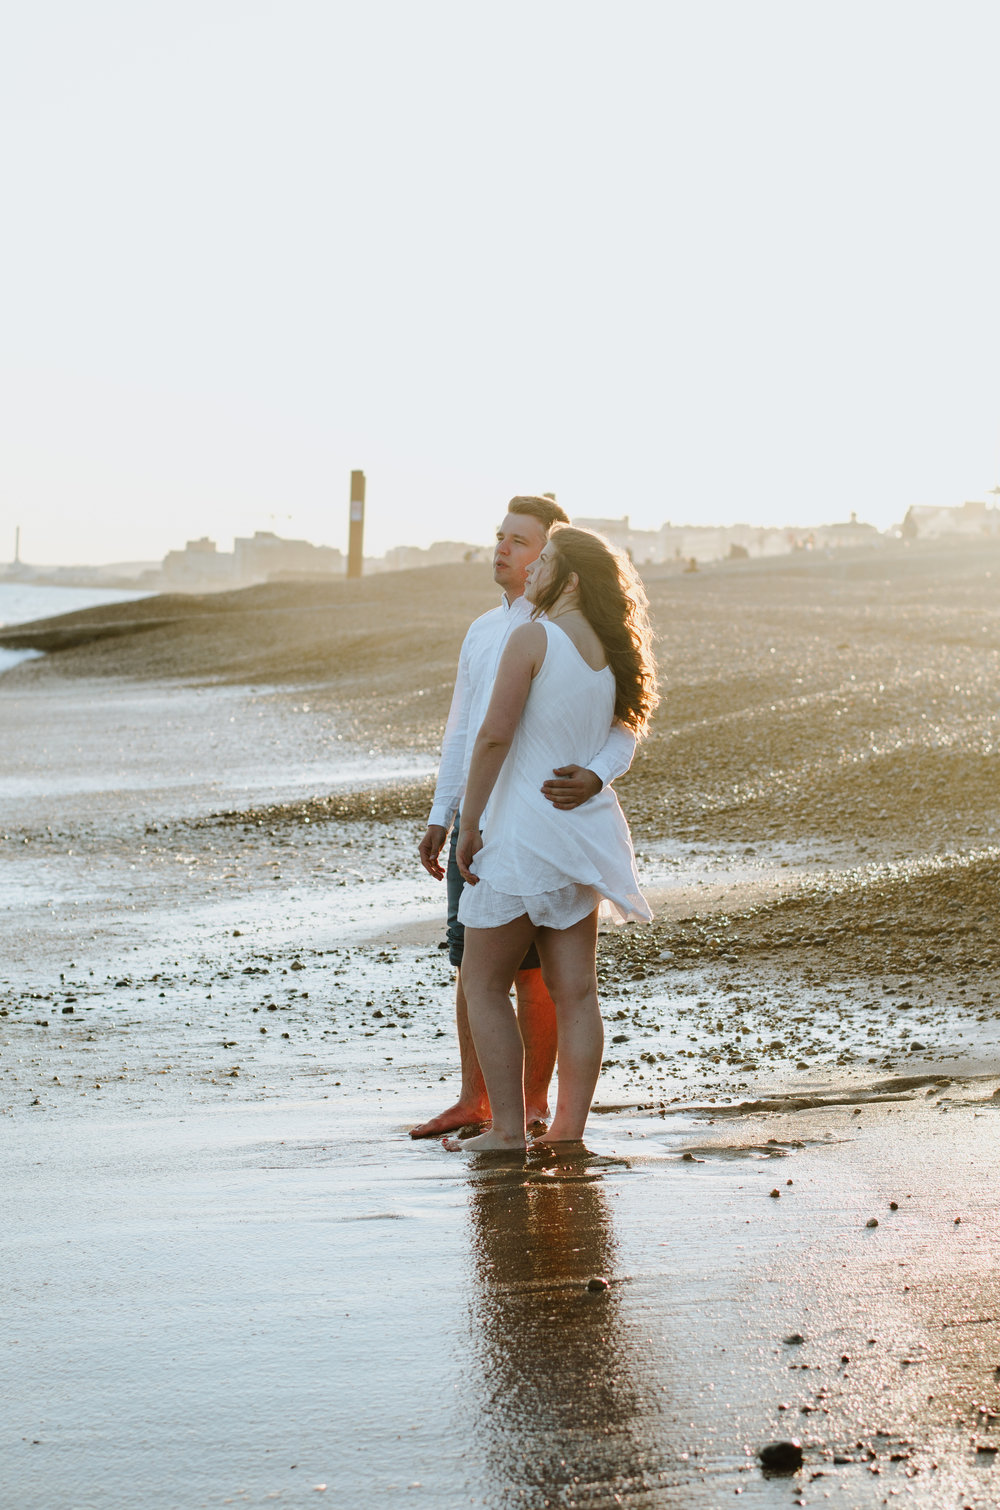 Ieva & Julius - Brighton Beach - Couple Session - Aiste Saulyte Photography-32.jpg